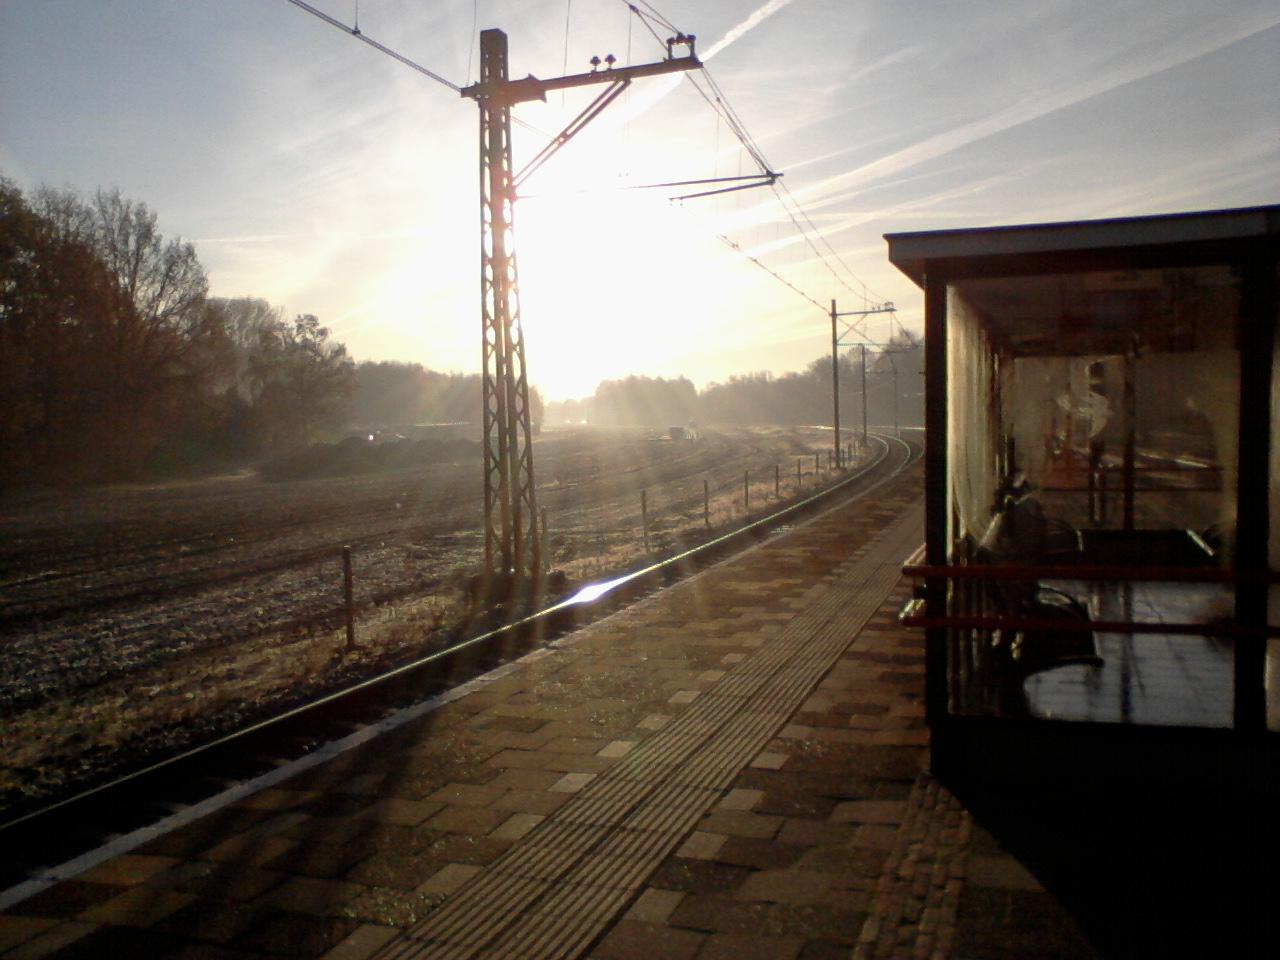 Station Nuth Novemberochtend 01.jpg